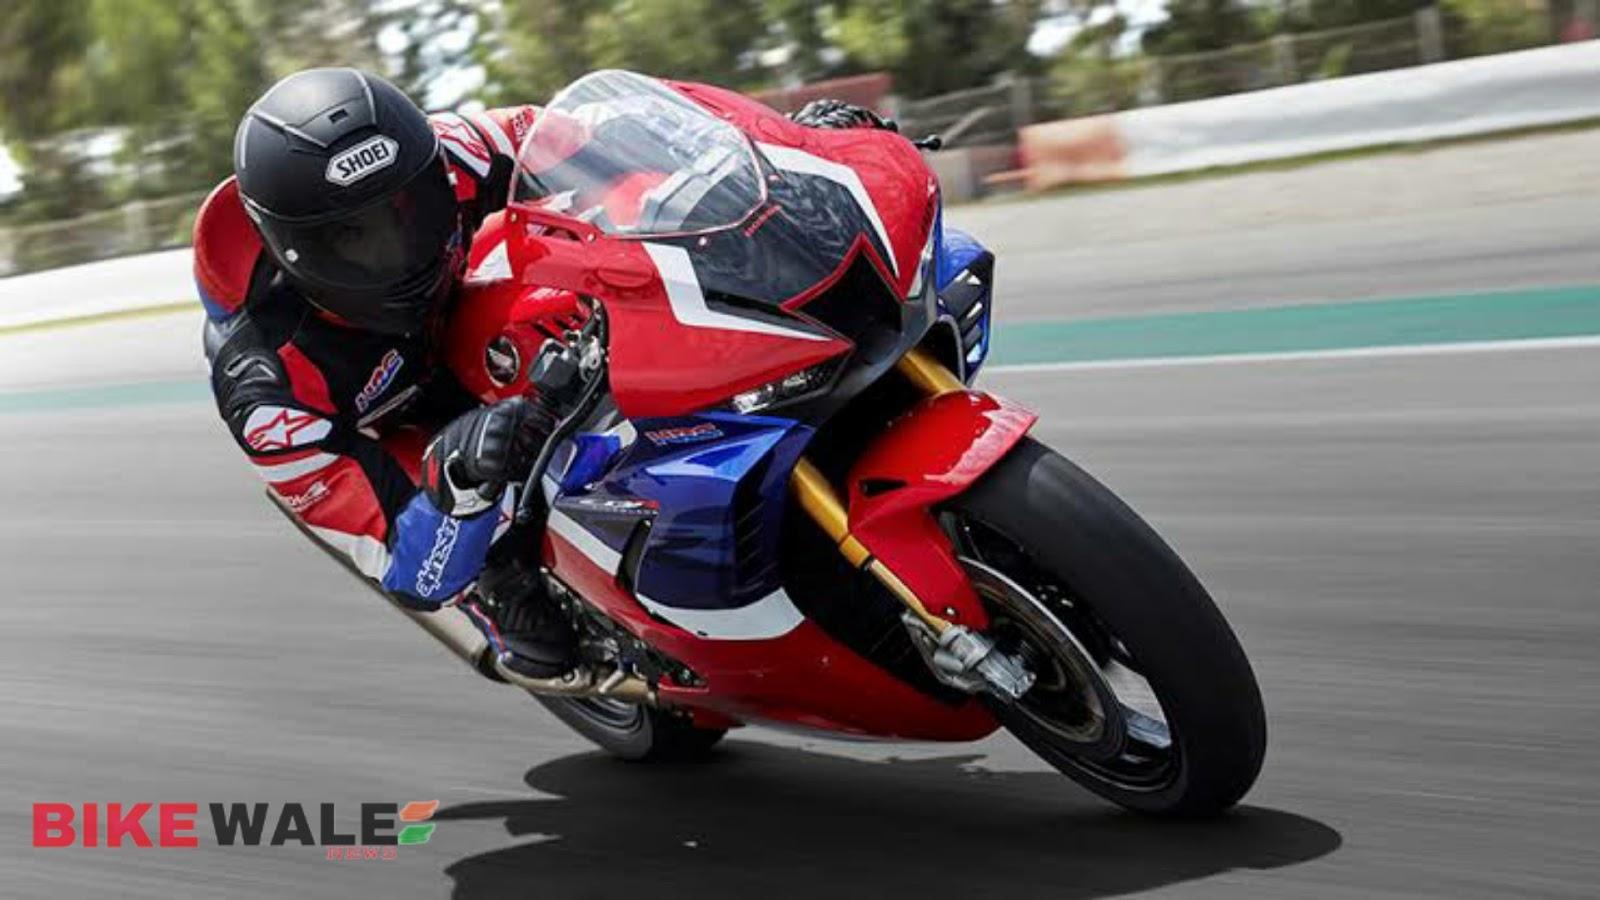 2020 HONDA CBR1000RR R PRICE IN INDIA   Bike wale News 1600x900